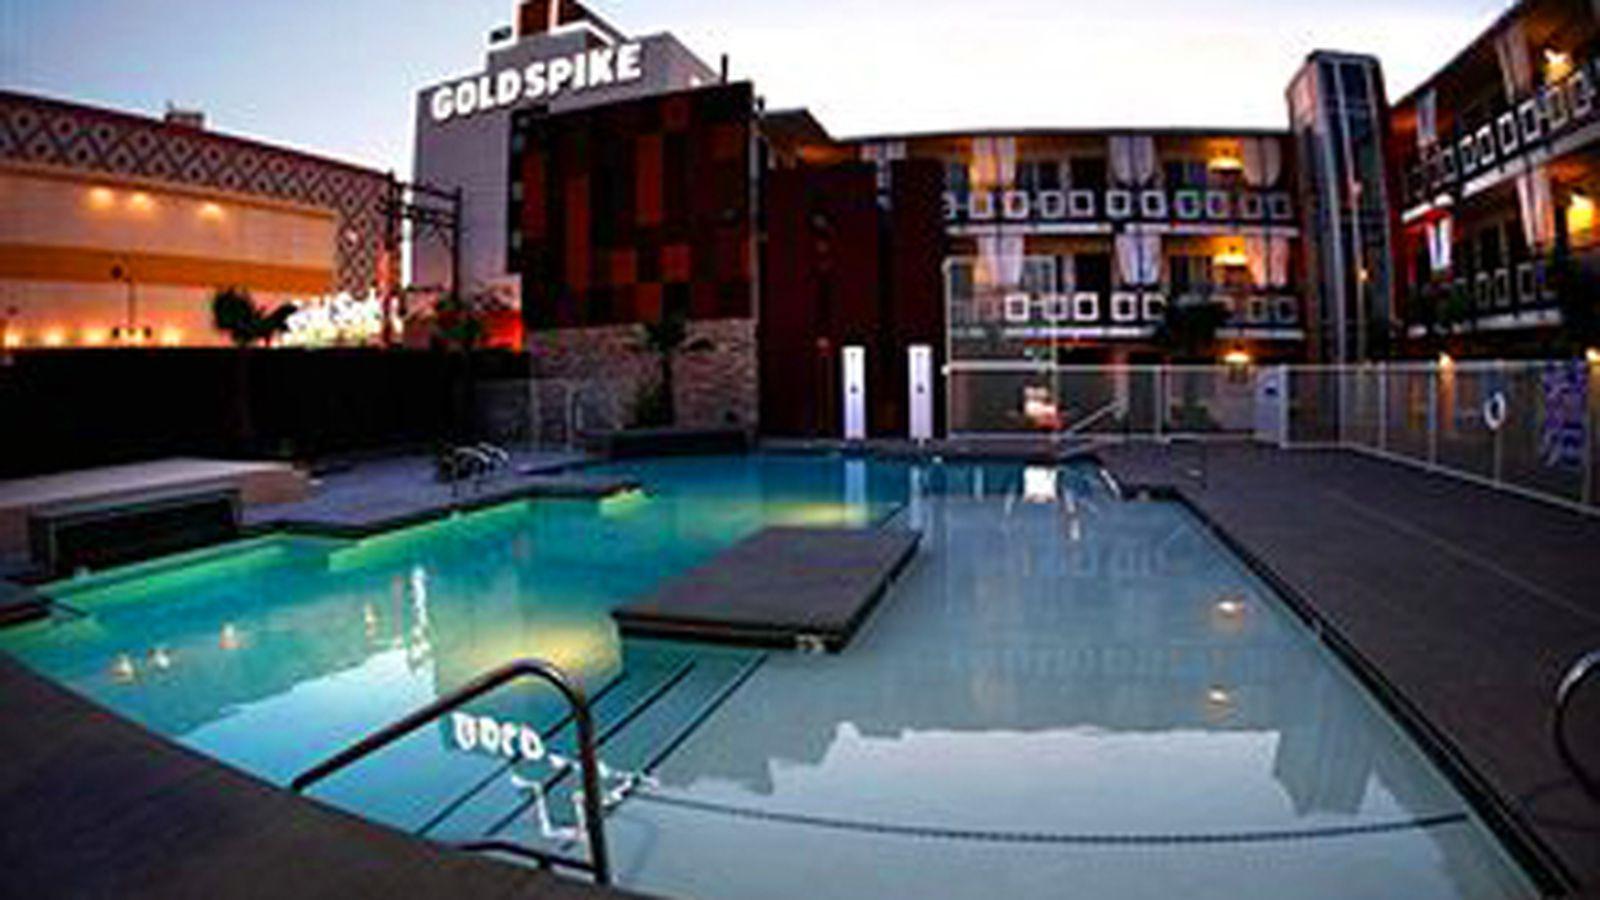 Gold spike hotel casino las vegas casino hotel in name ont orillia rama